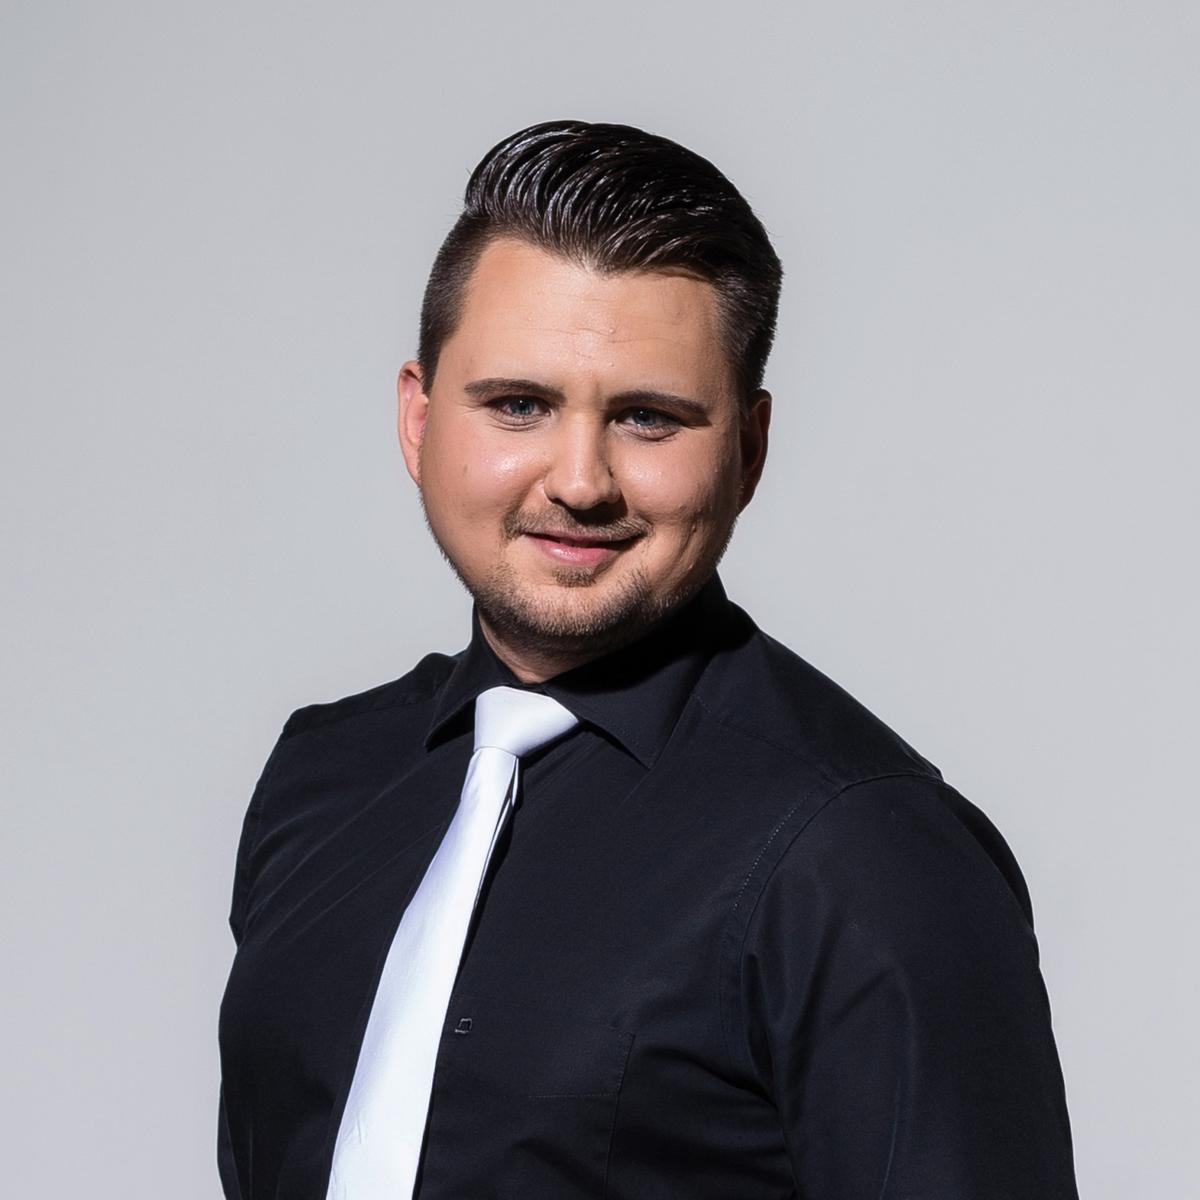 Christian Silbernagel